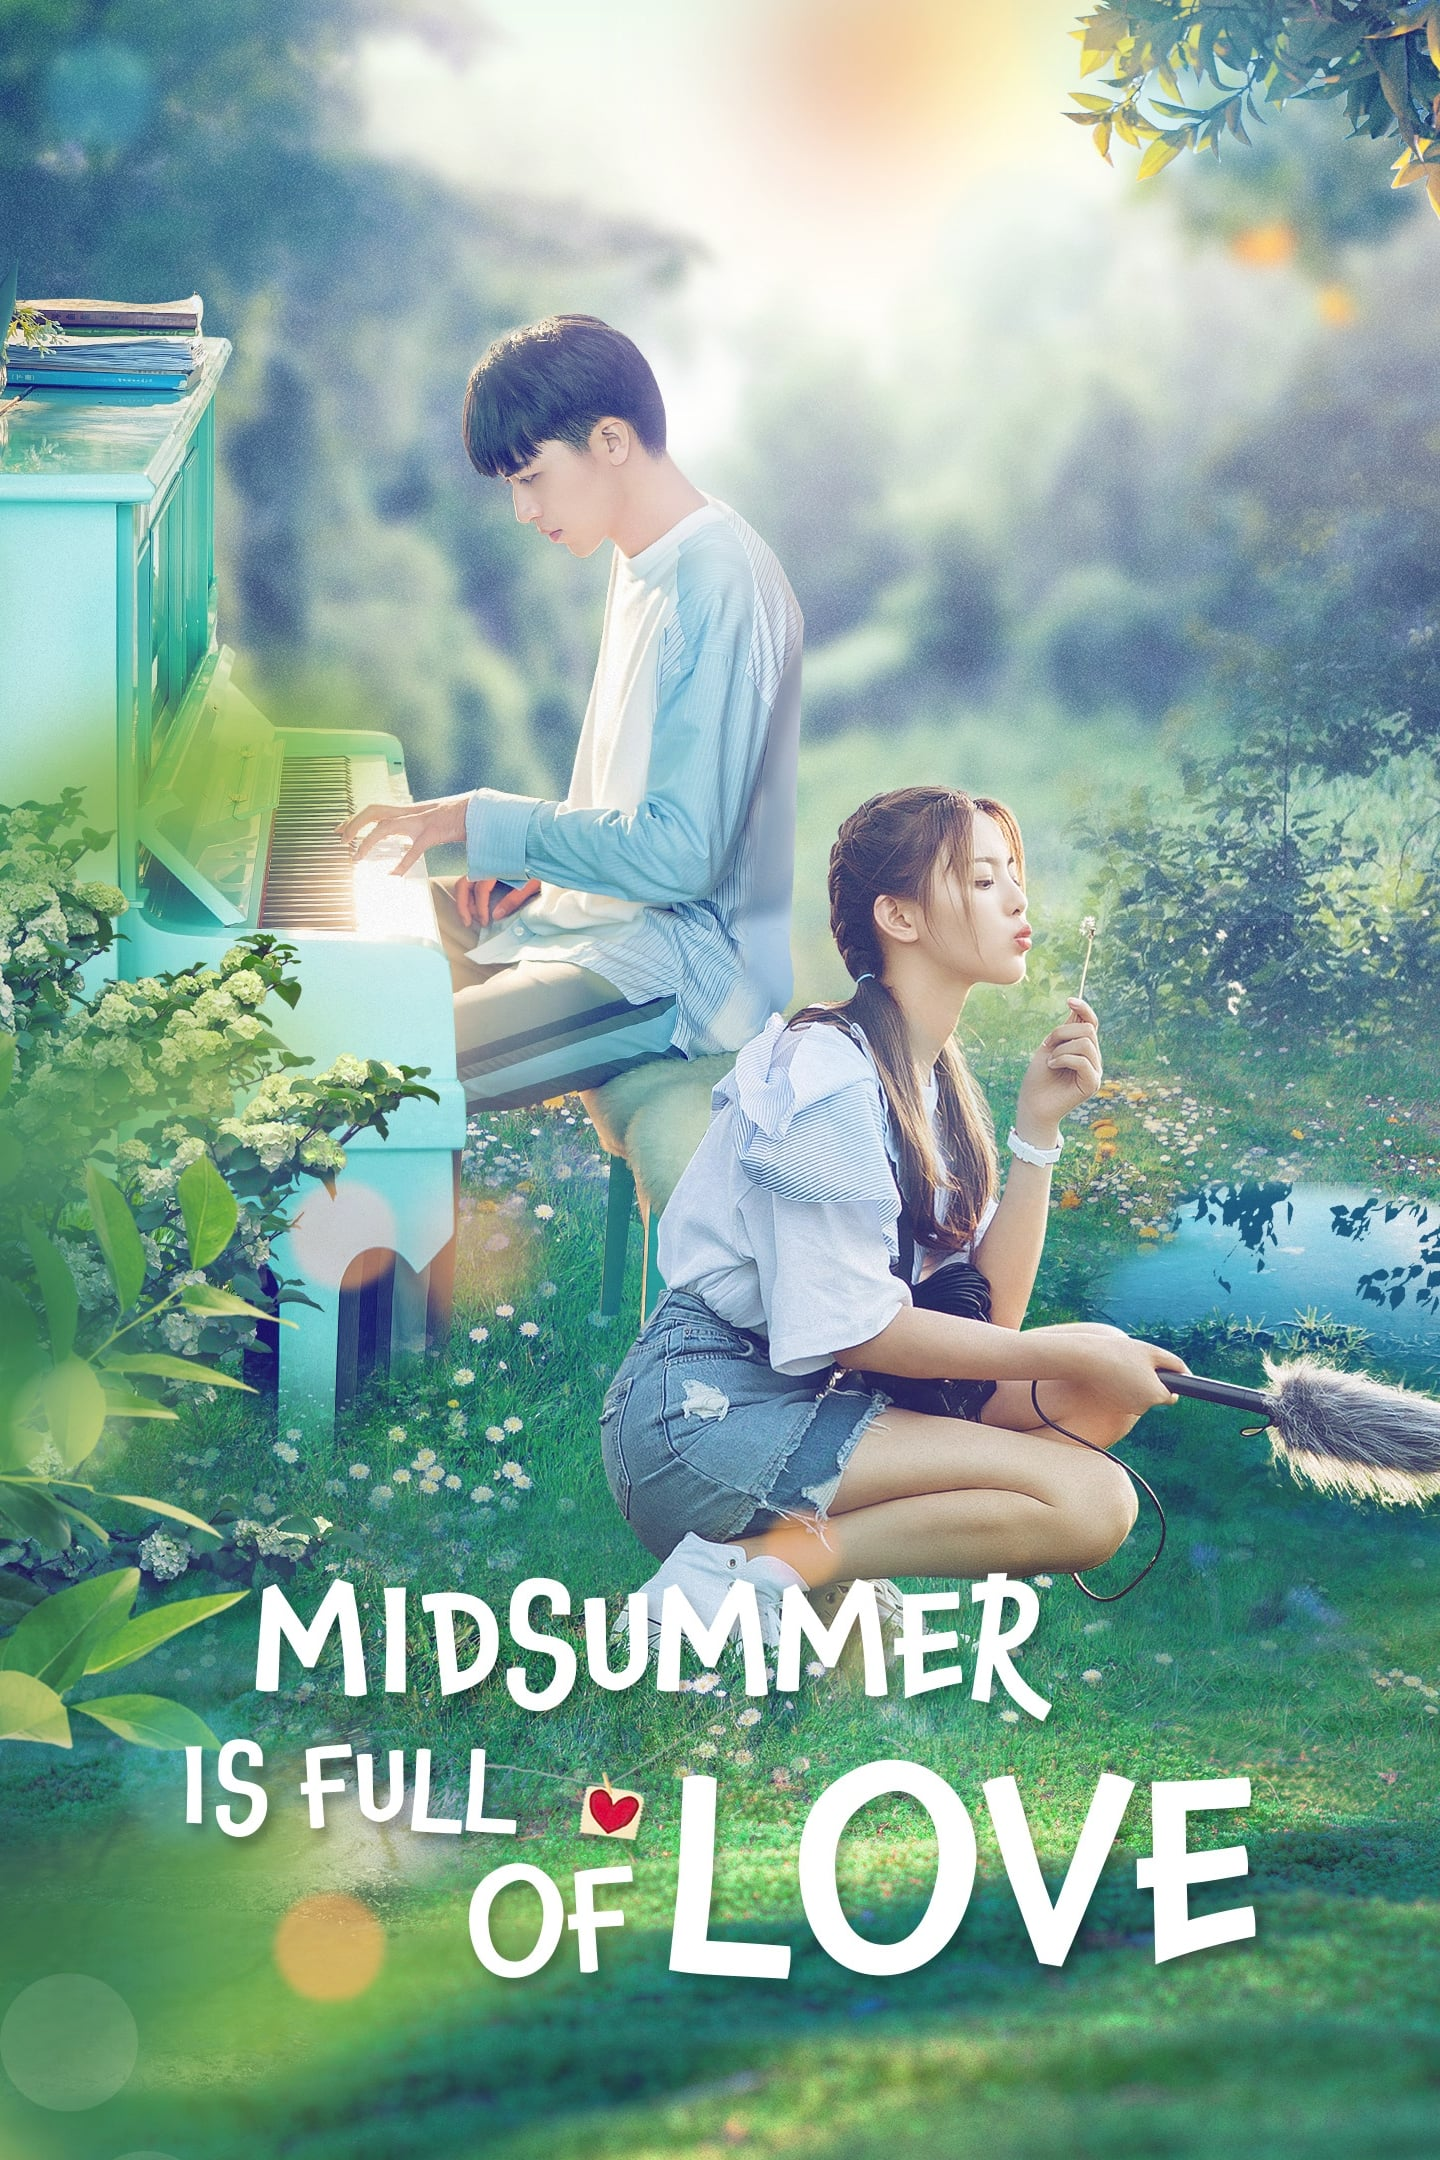 midsummer-is-full-of-love-2020-รักวุ่นๆ-ในฤดูร้อน-ตอนที่-1-9-ซัพไทย